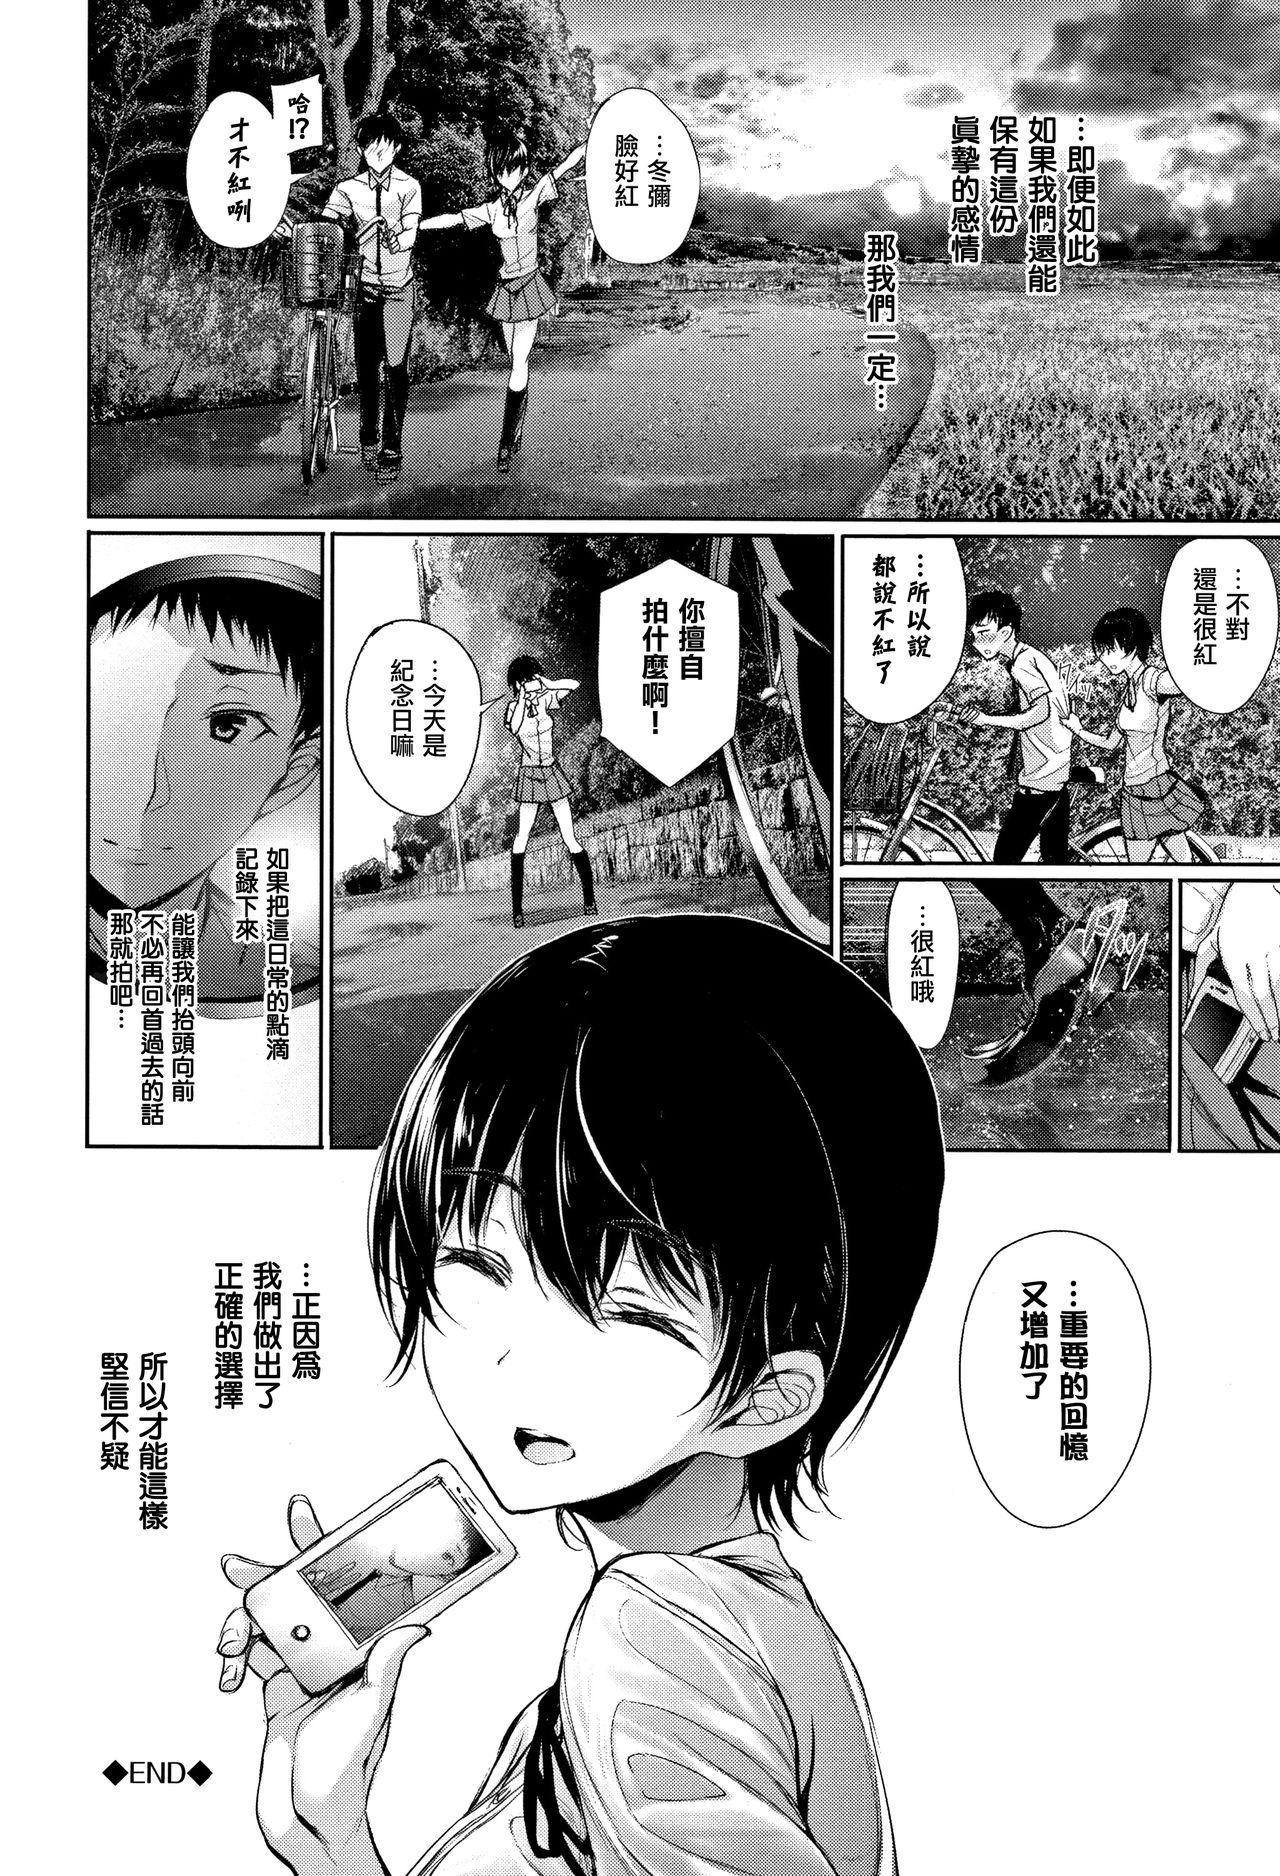 [Gentsuki] Kimi Omou Koi - I think of you. Ch. 1-4 [Chinese] [无毒汉化组] 48